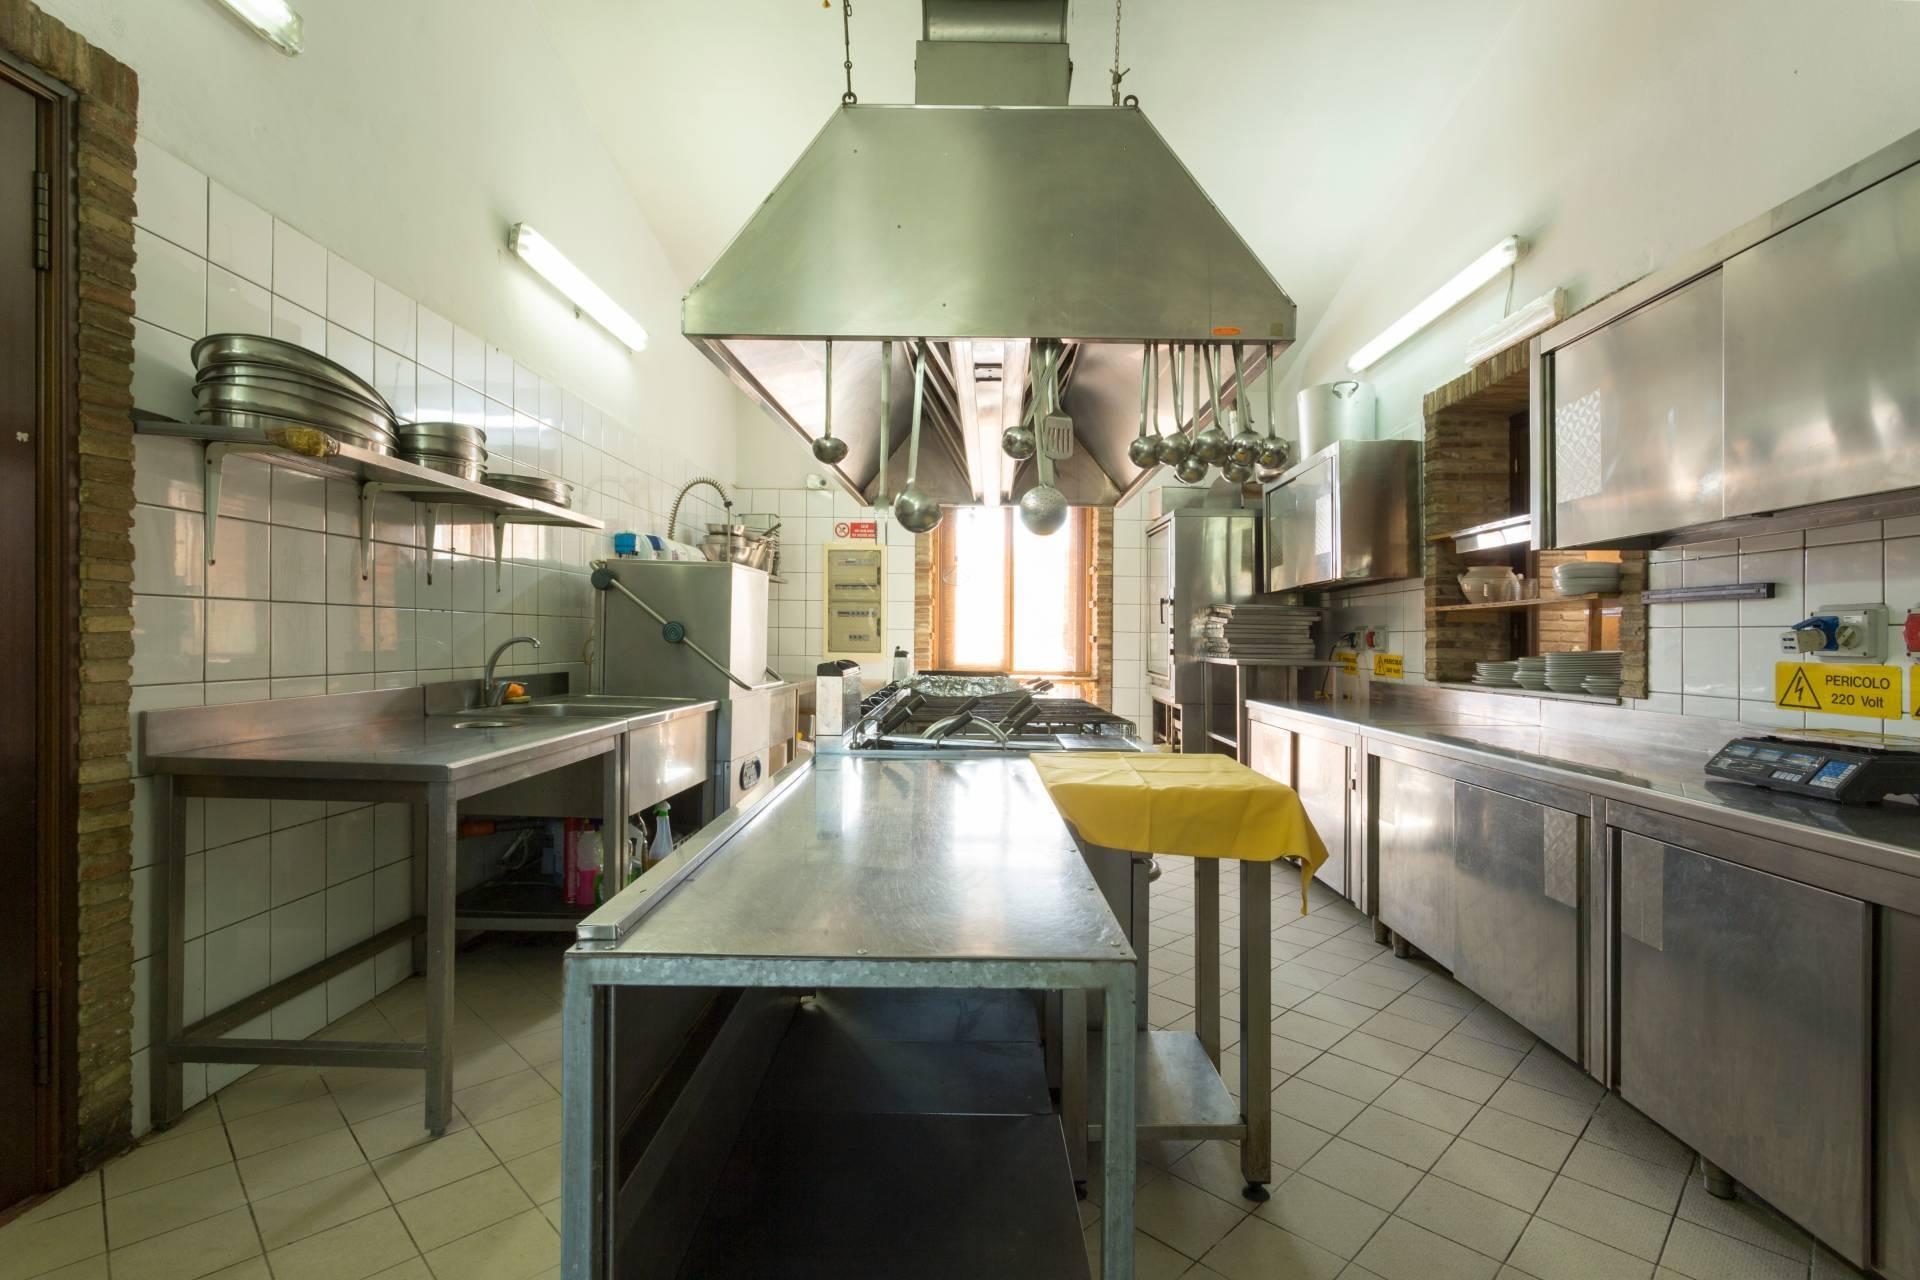 Villa in Vendita a Piazza Armerina: 5 locali, 550 mq - Foto 23